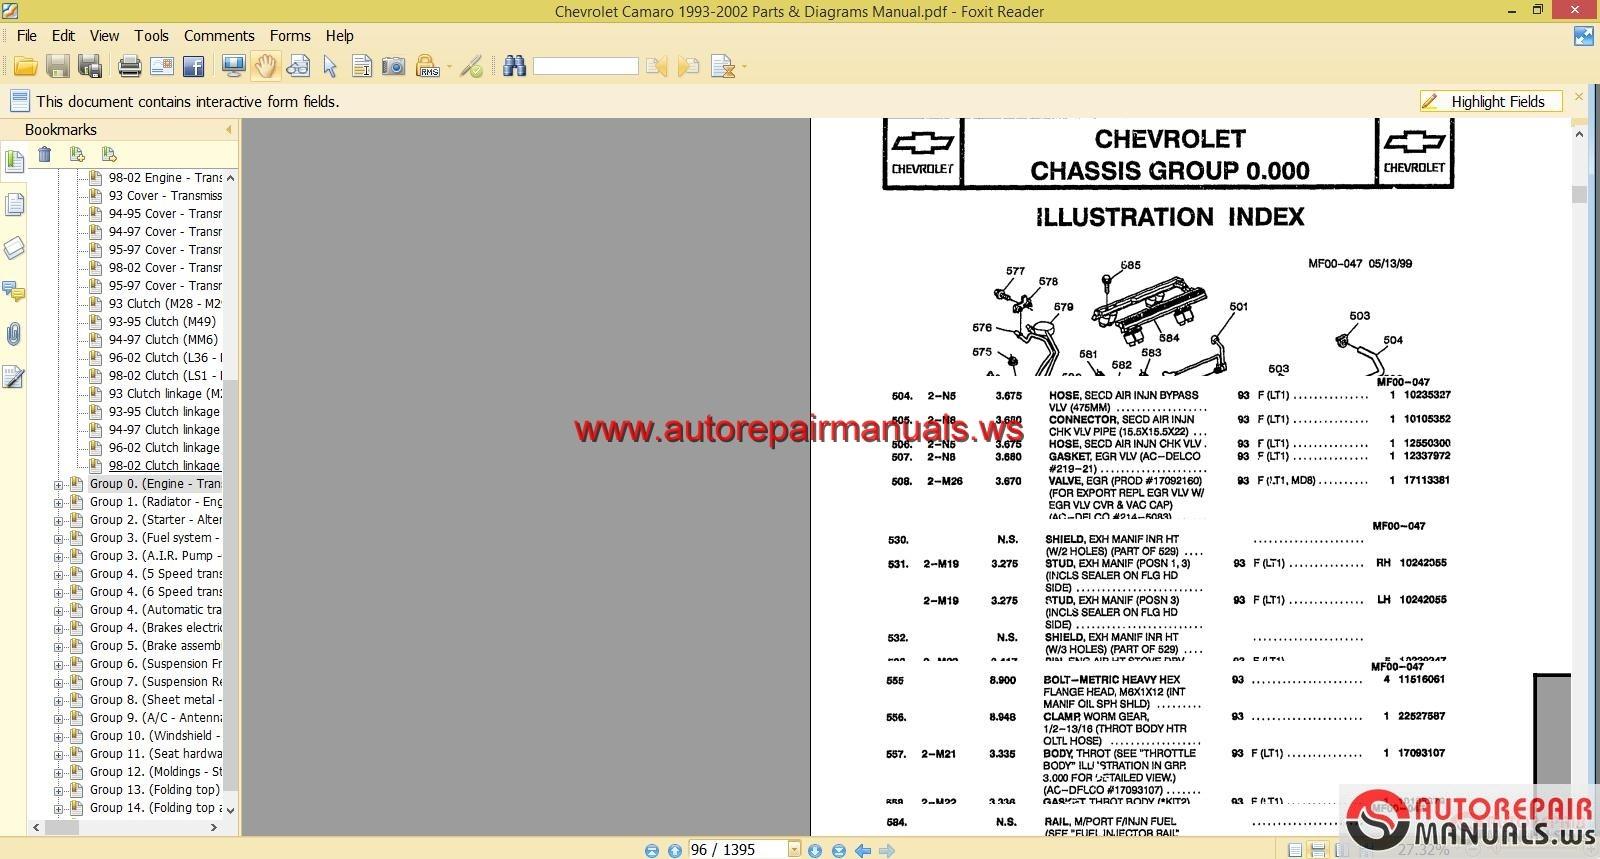 Chevrolet Camaro 1993